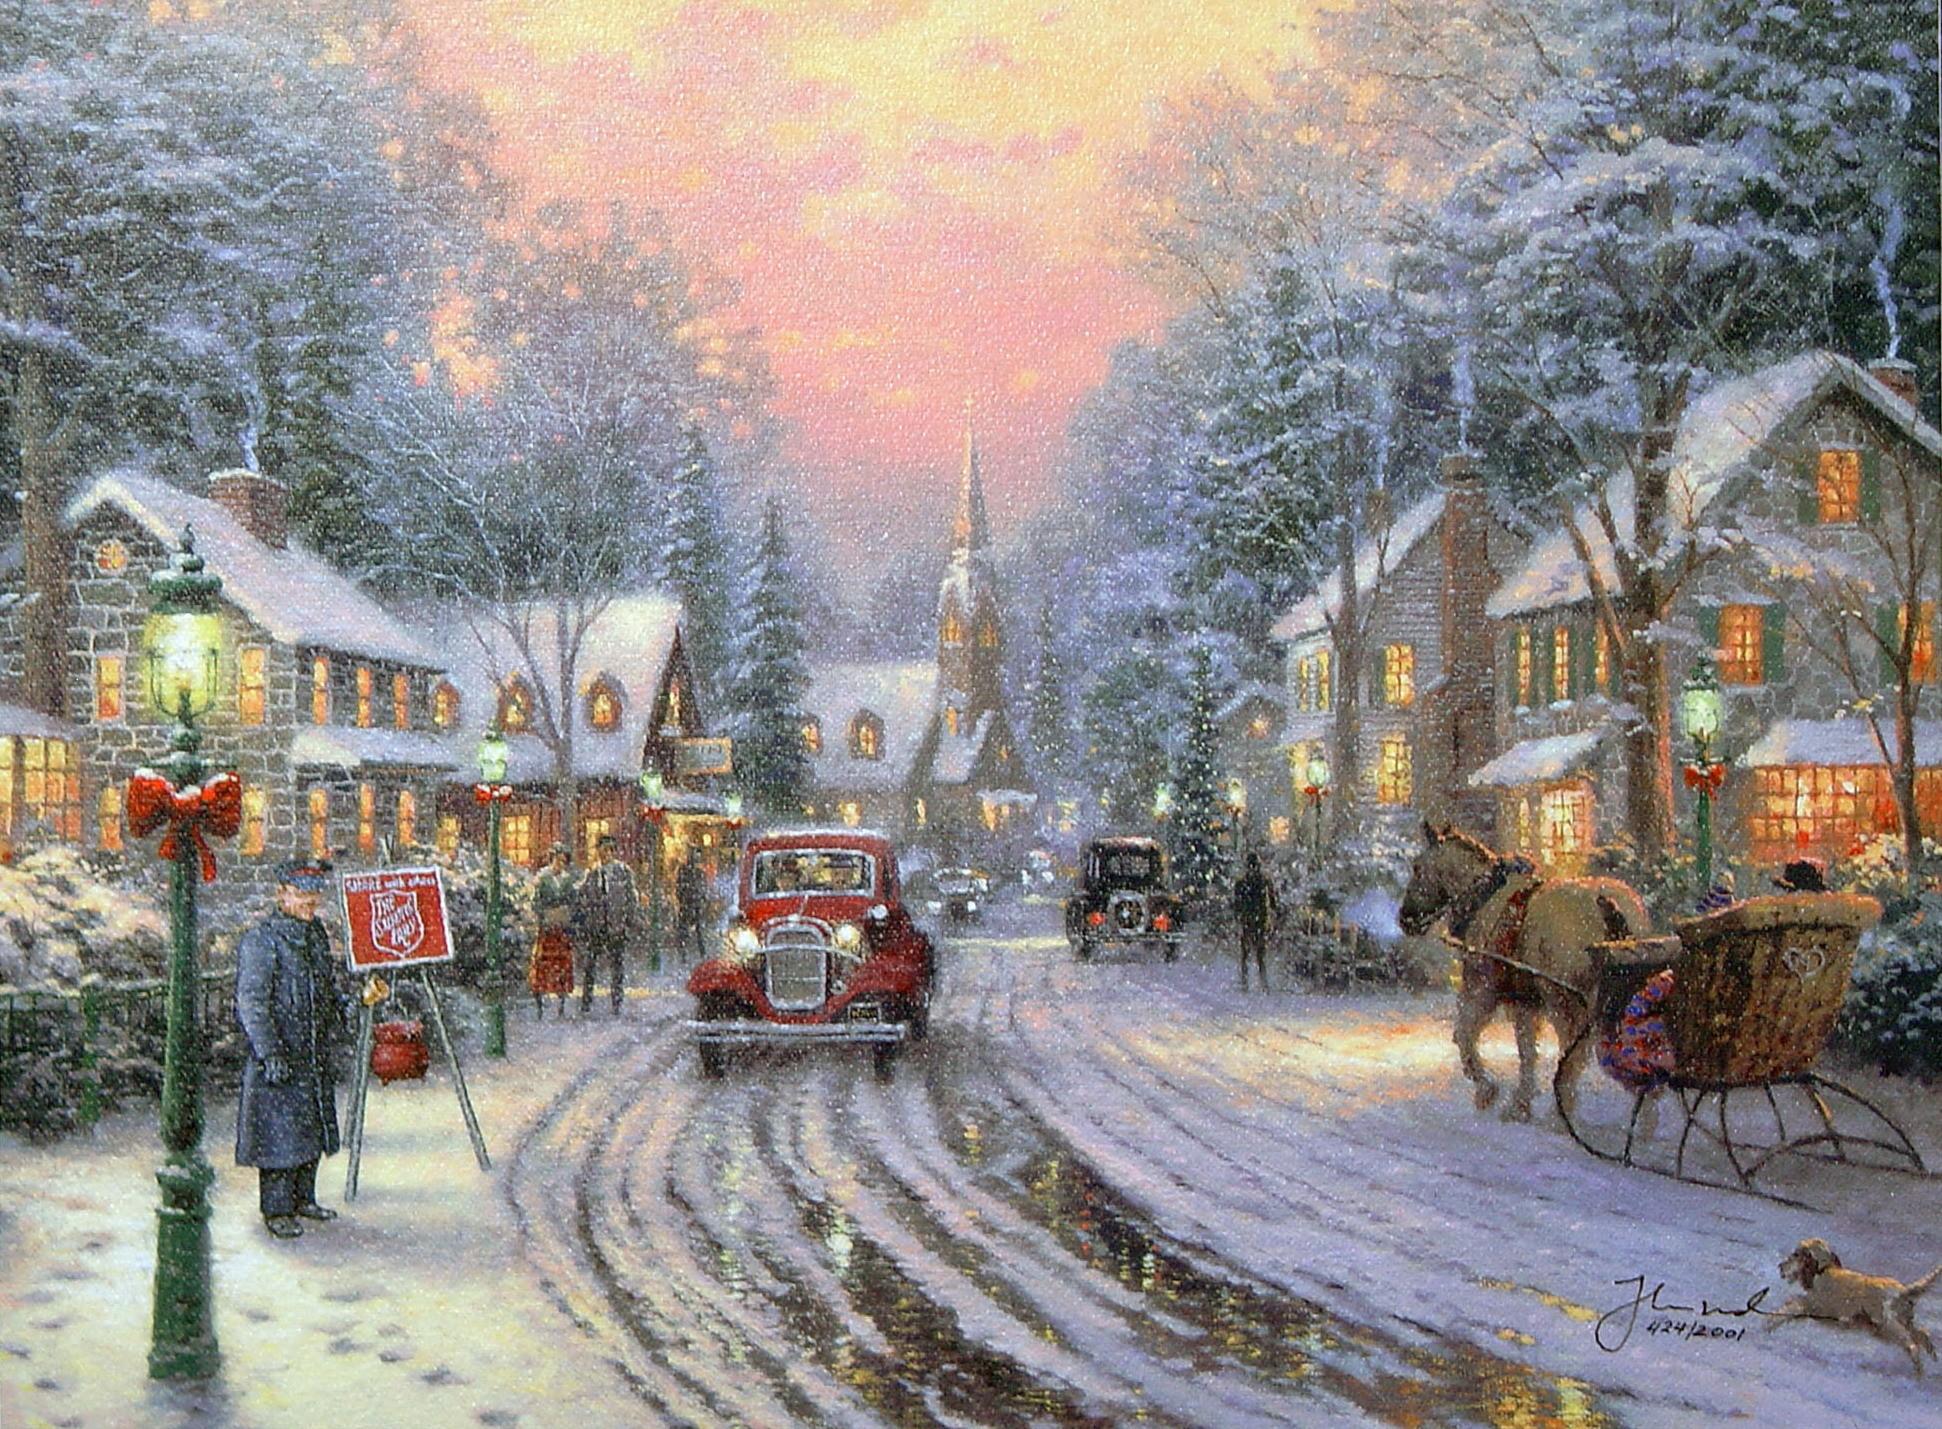 Thomas Kinkade Christmas Wallpaper (18)